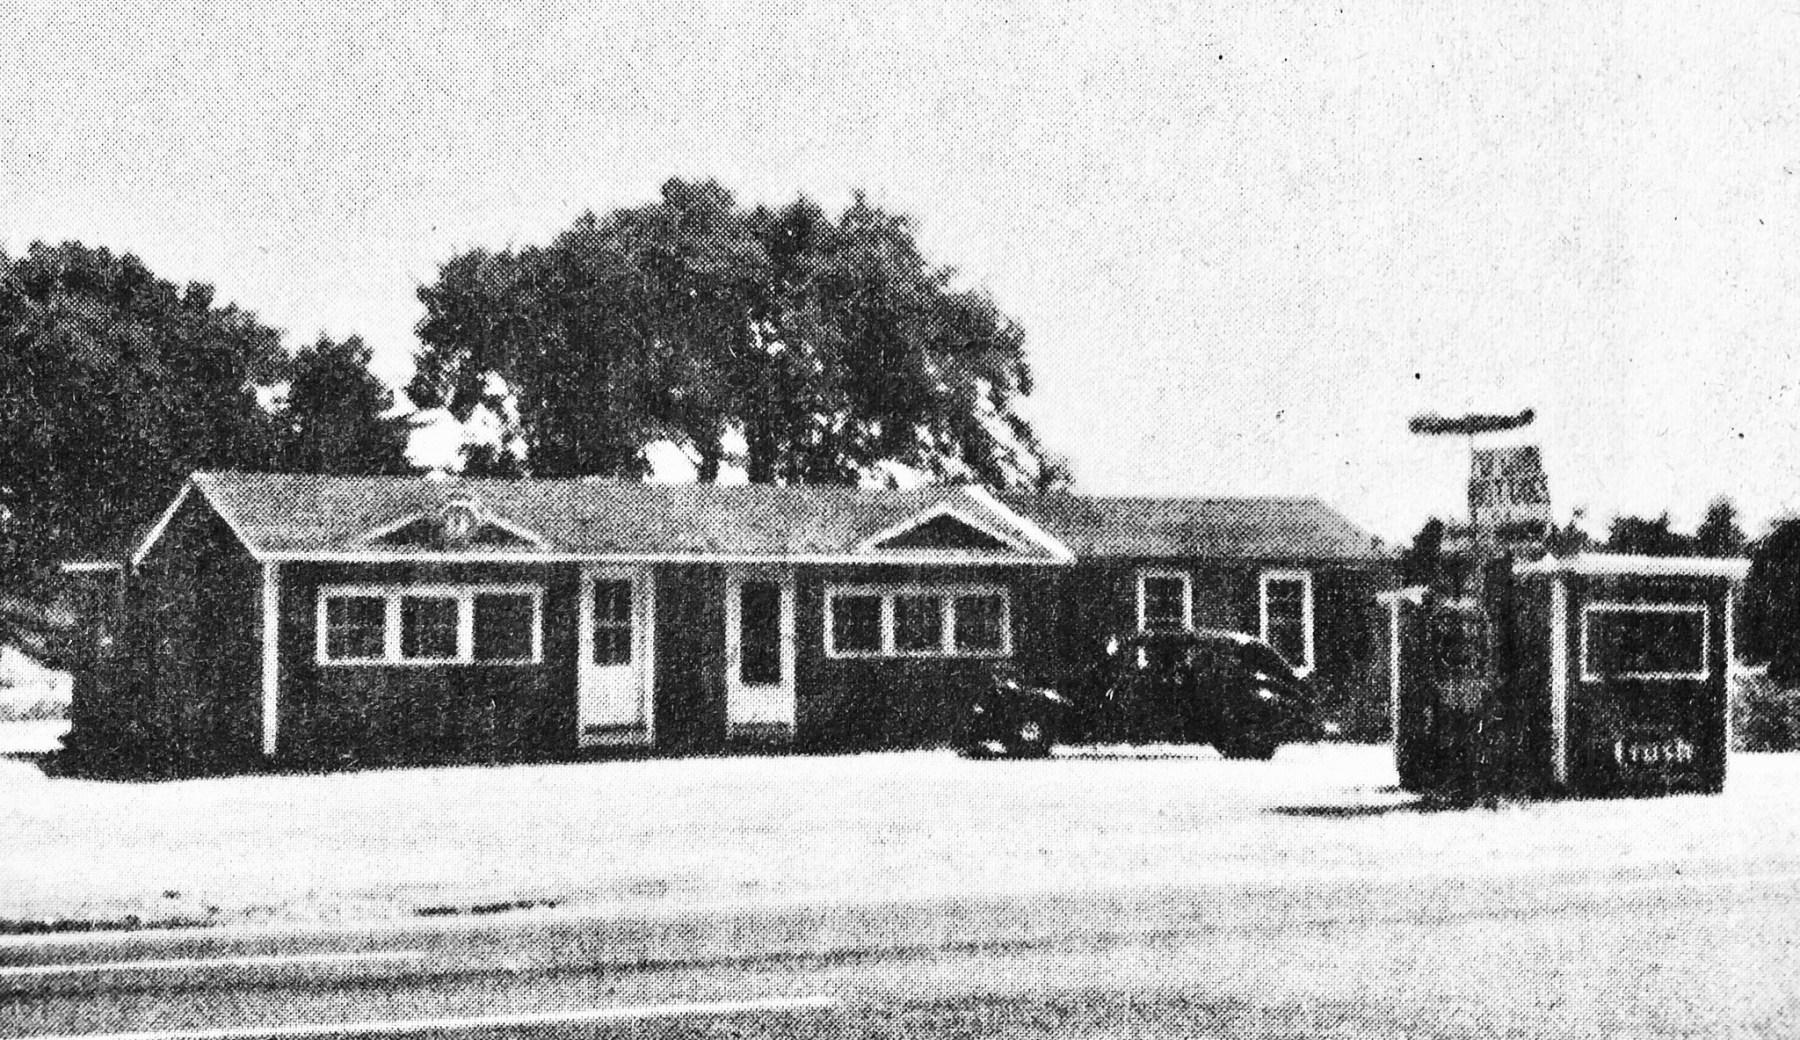 Flying Saucer Restaurant, Burlington MA, 1955